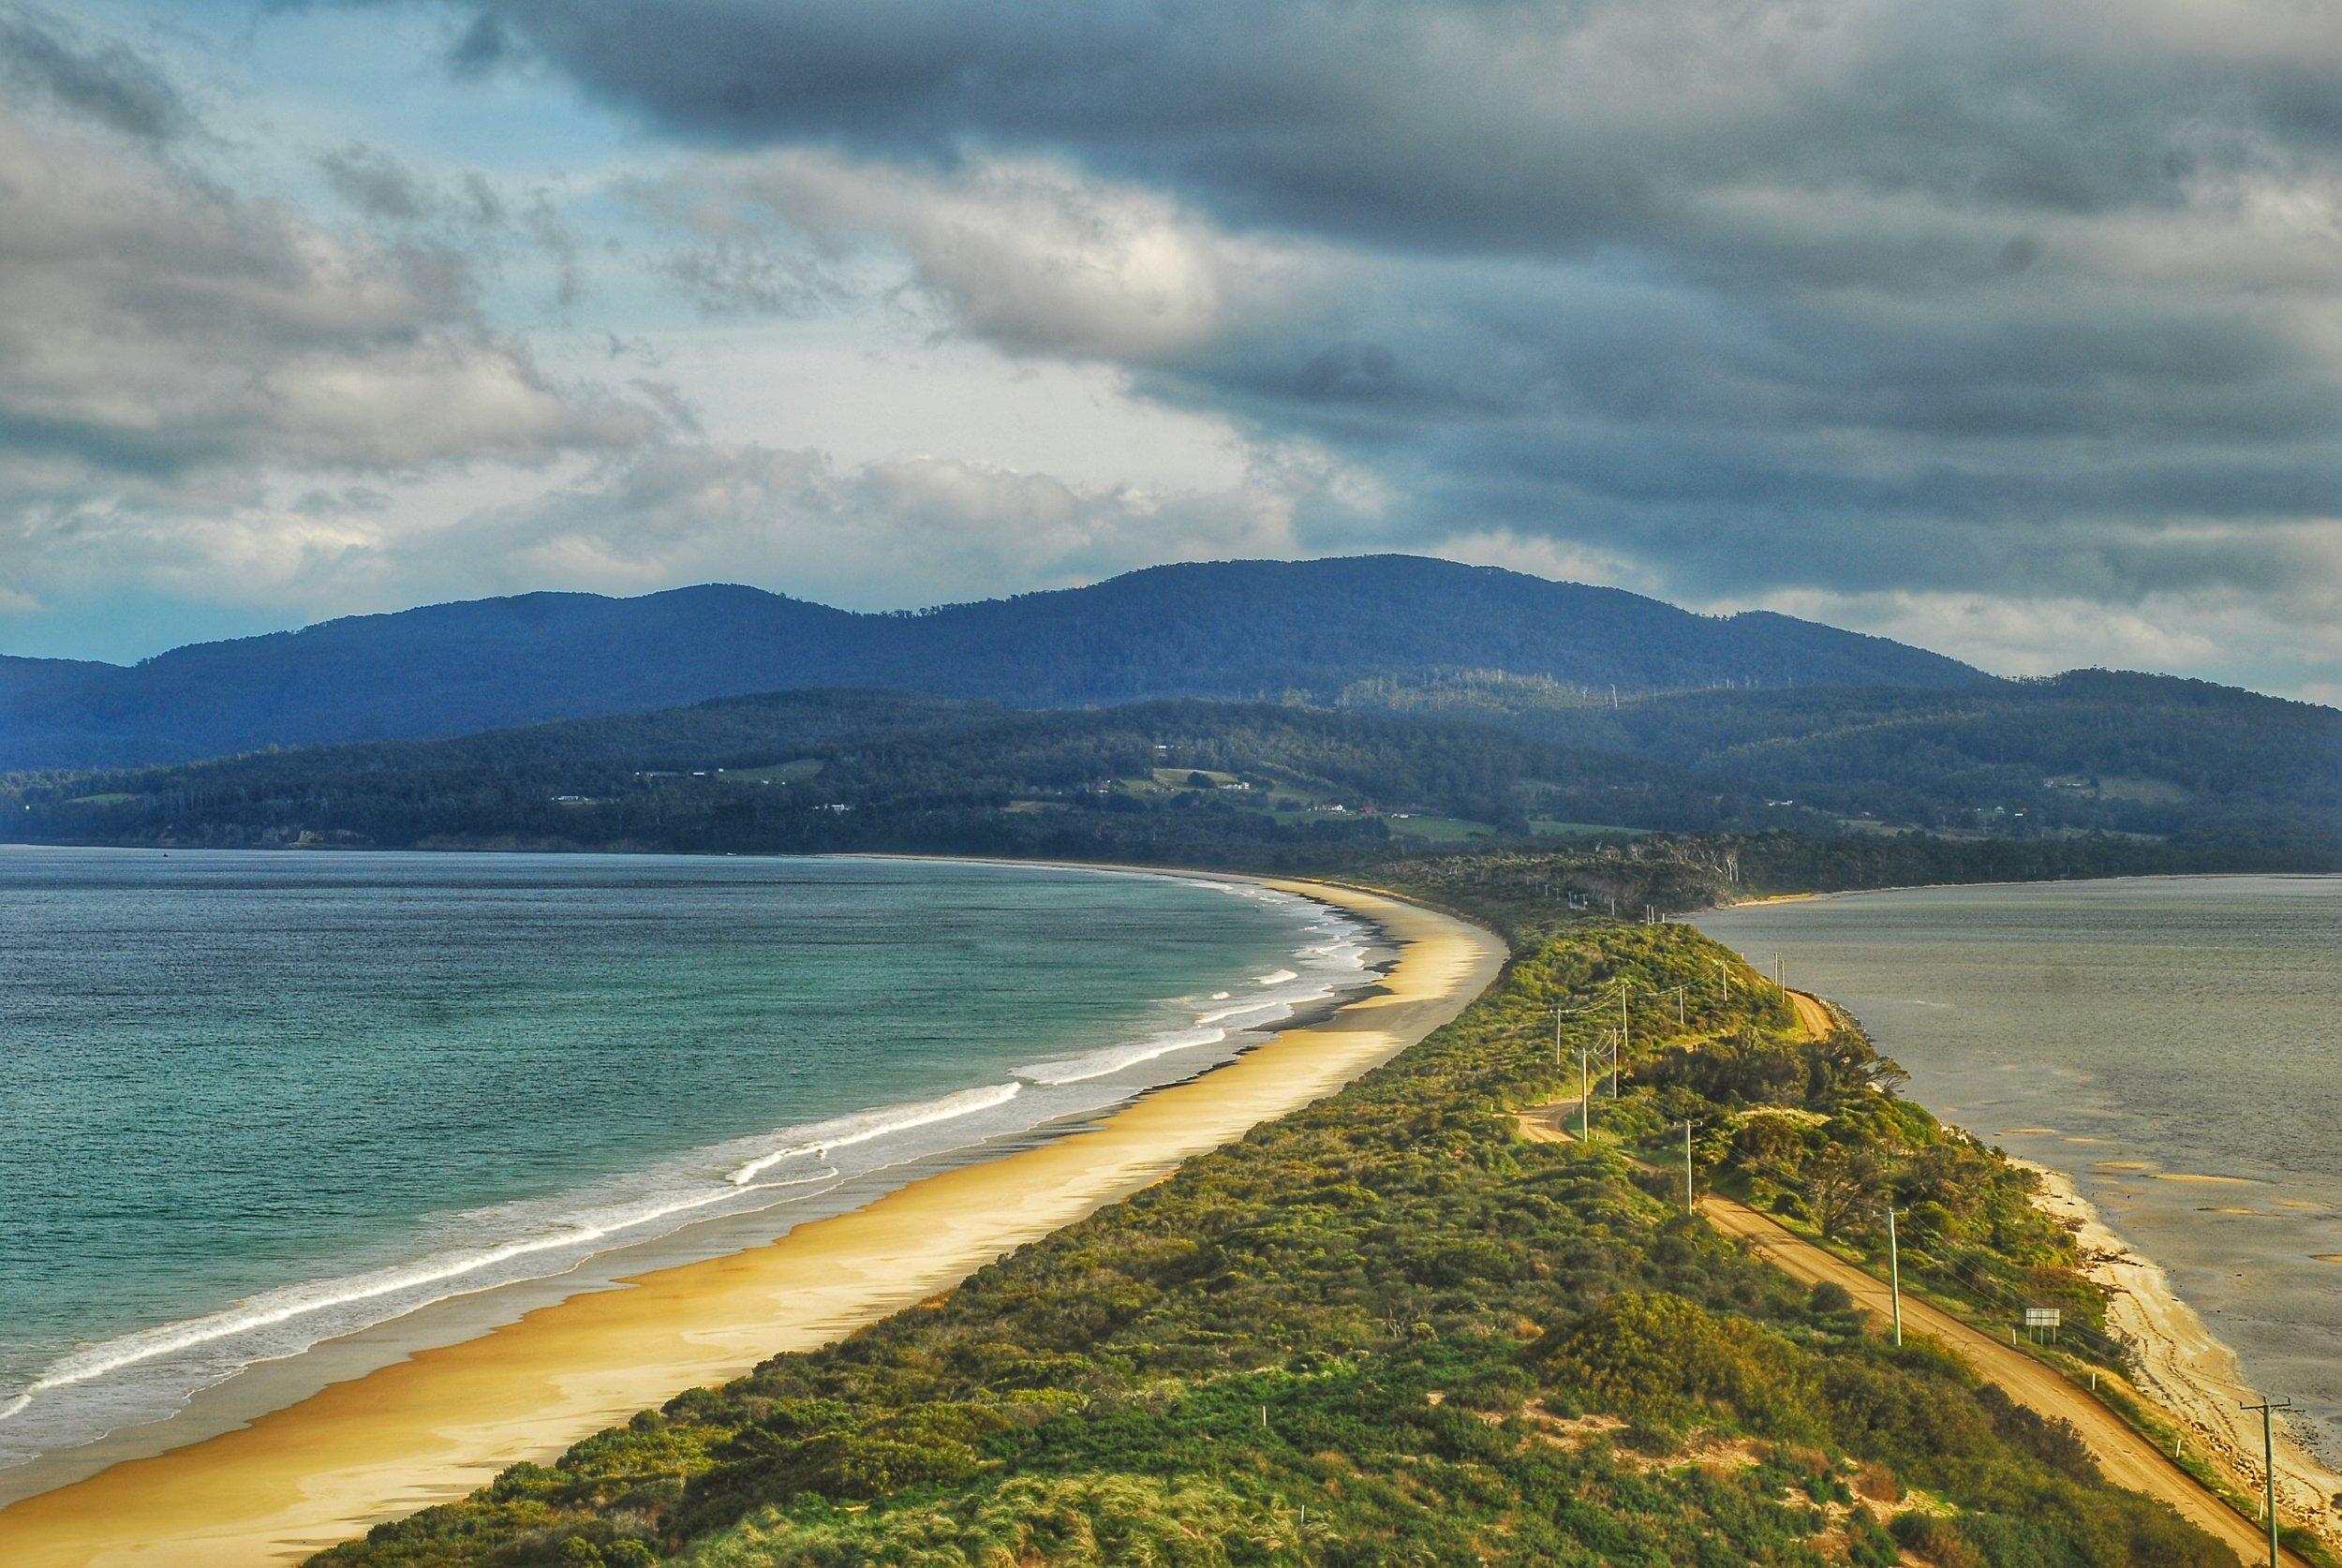 Bruny Island is located off the coast of Tasmania, Australia. Credit Samantha Andrews/Ocean Oculus